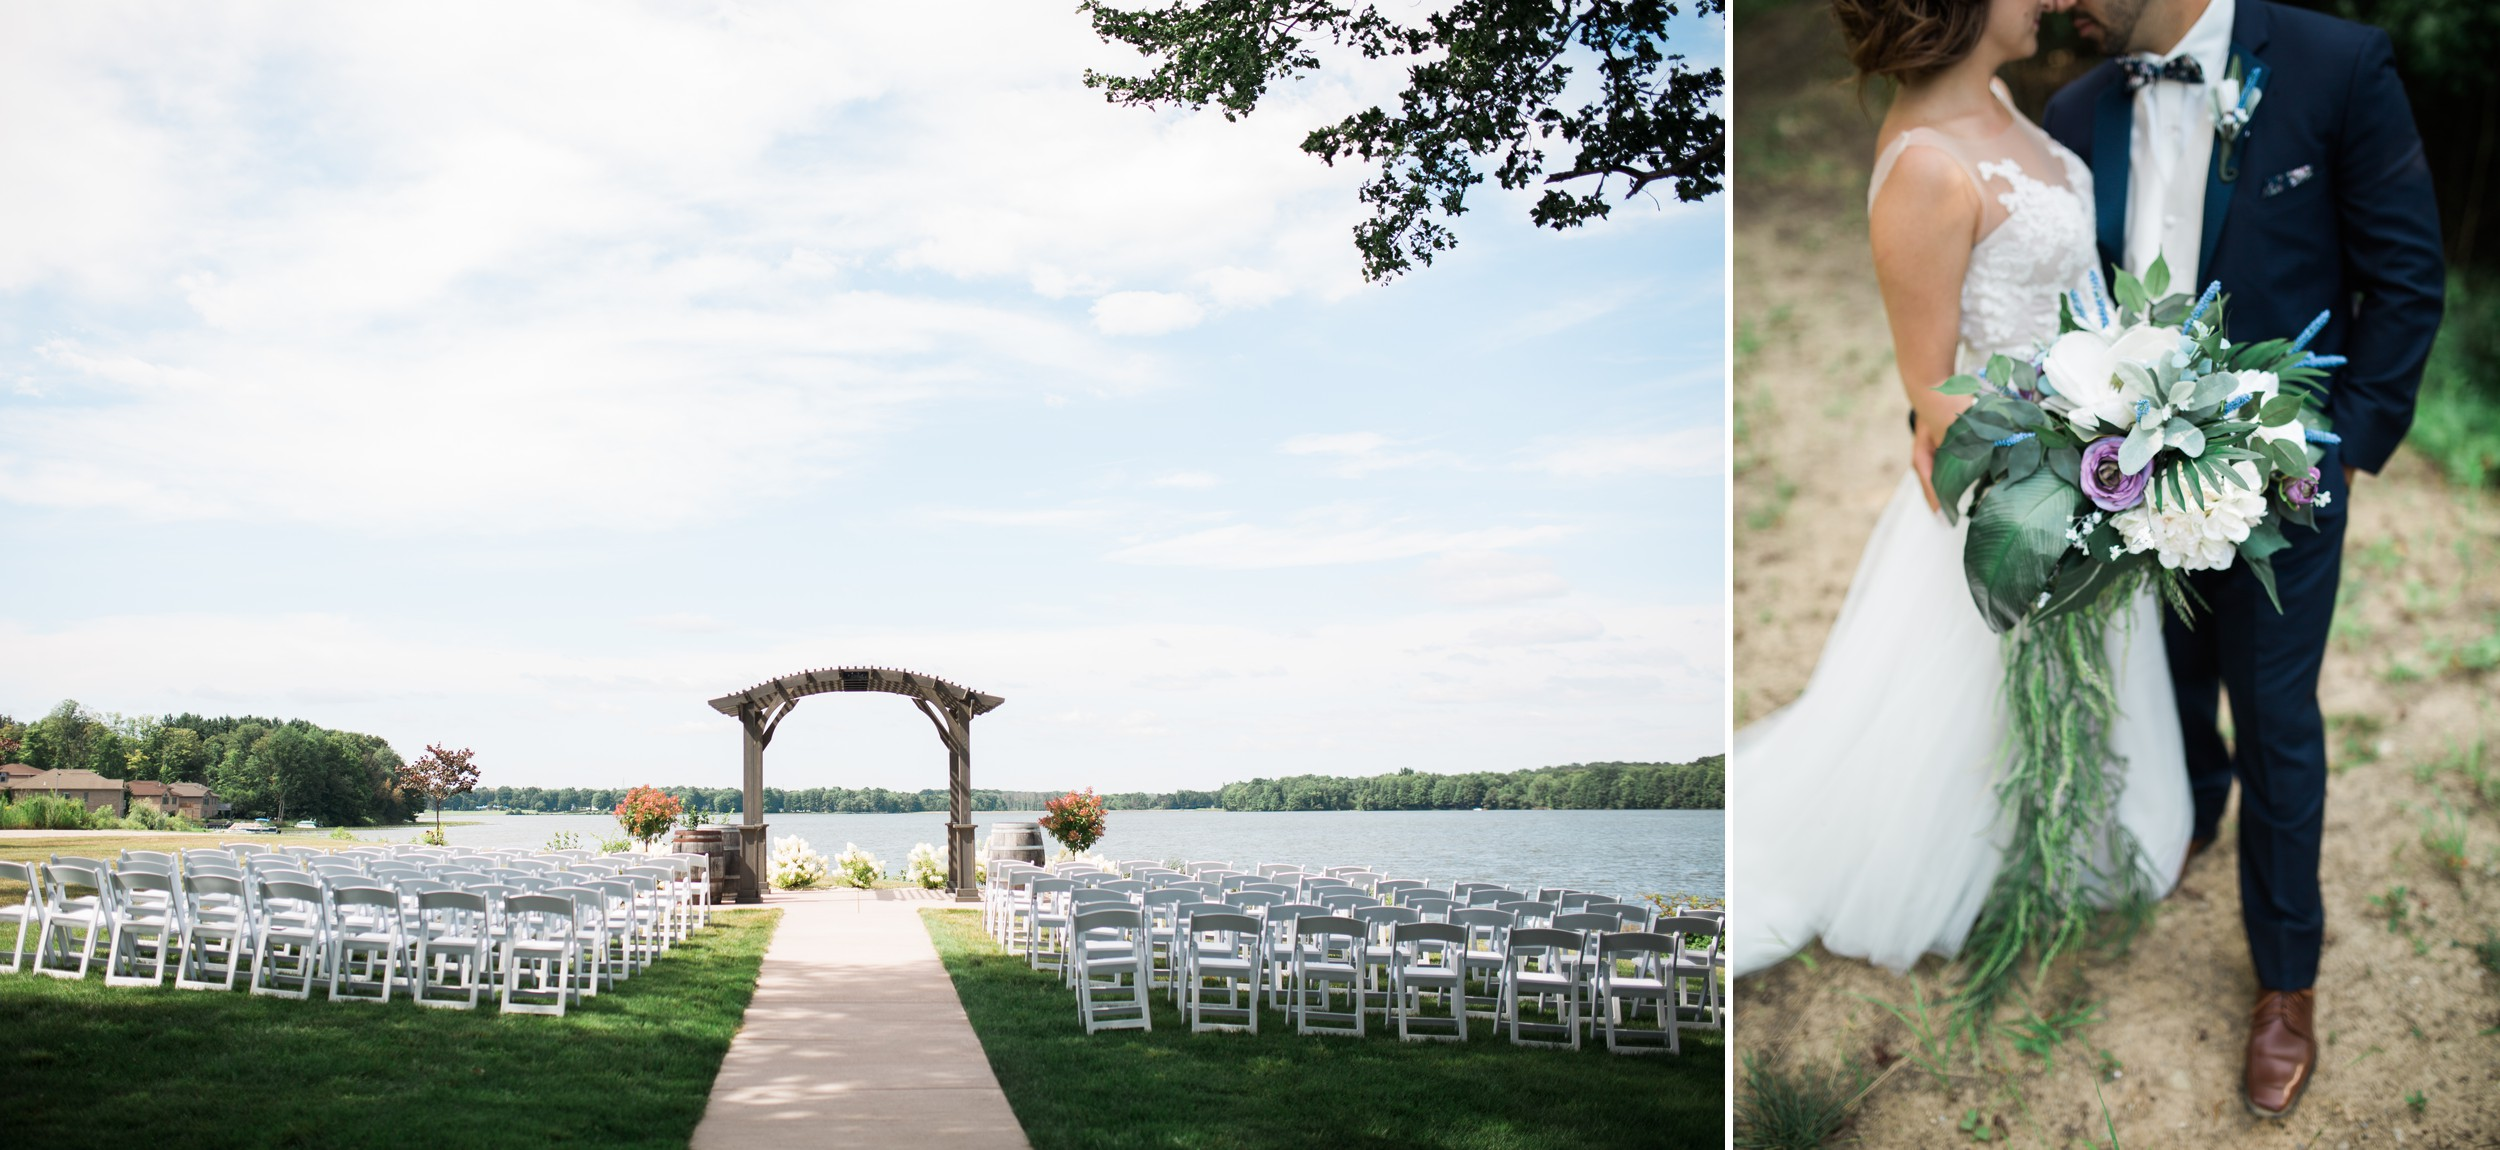 Nick-and-martina-pinelake-vinyards-wedding-columbiana-ohio-tracylynn-photography 28.jpg